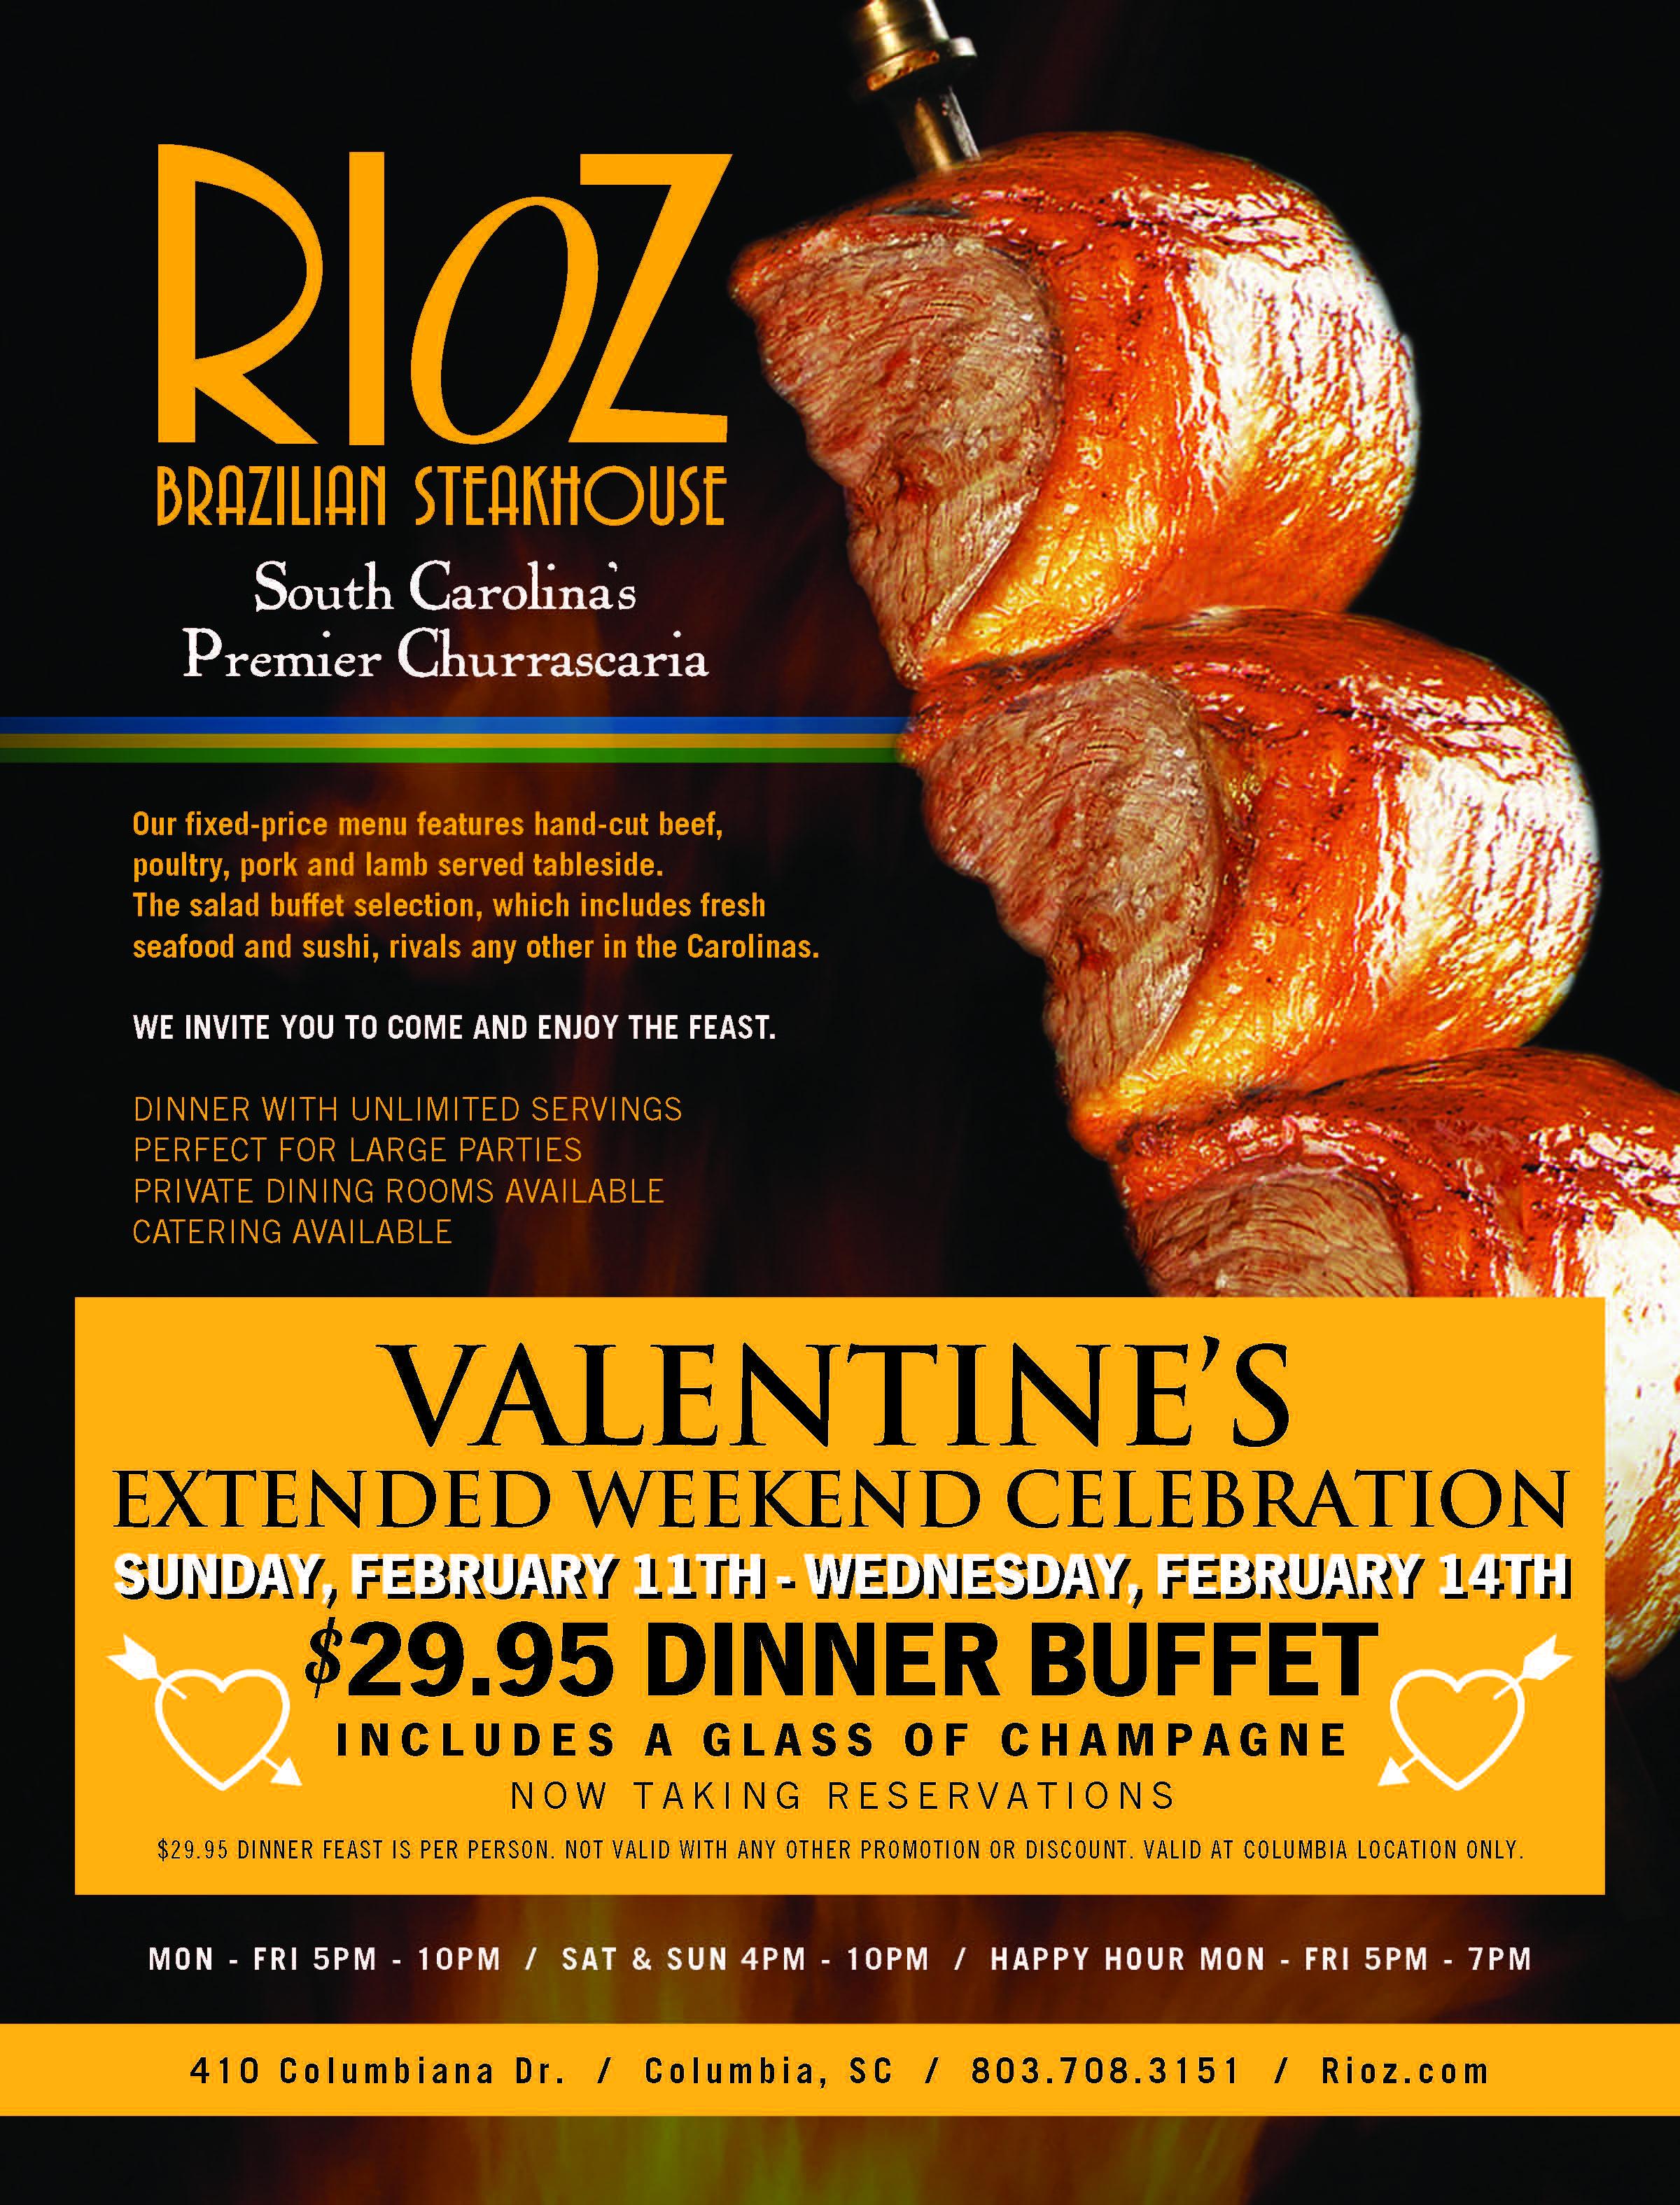 Rioz Cola Valentines Day Extended.jpg